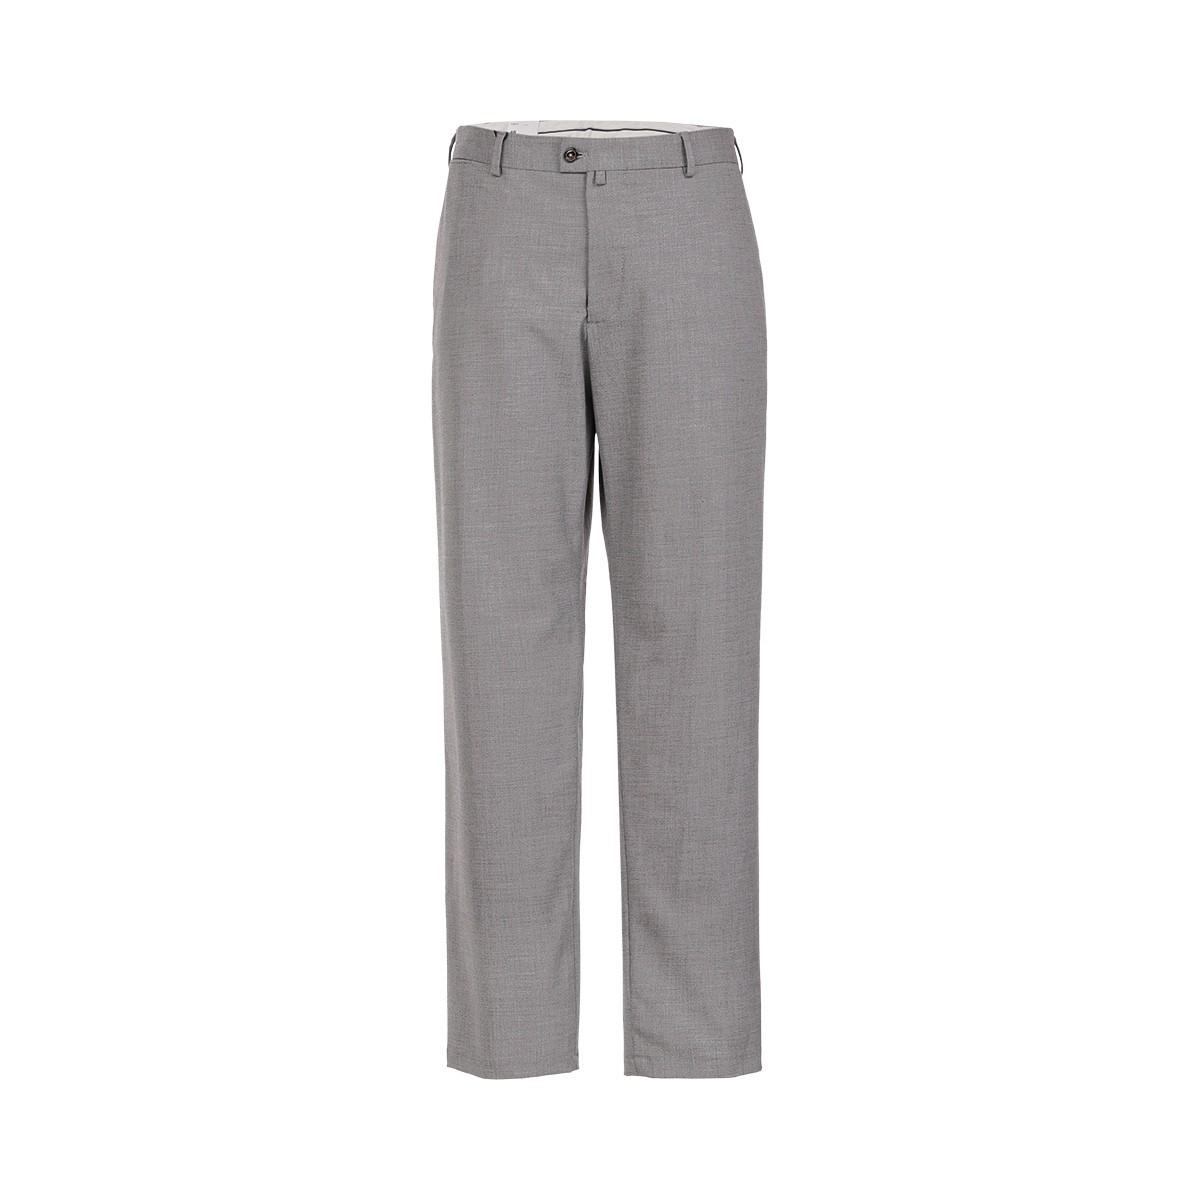 ZARA 00706796802 男士商务西裤